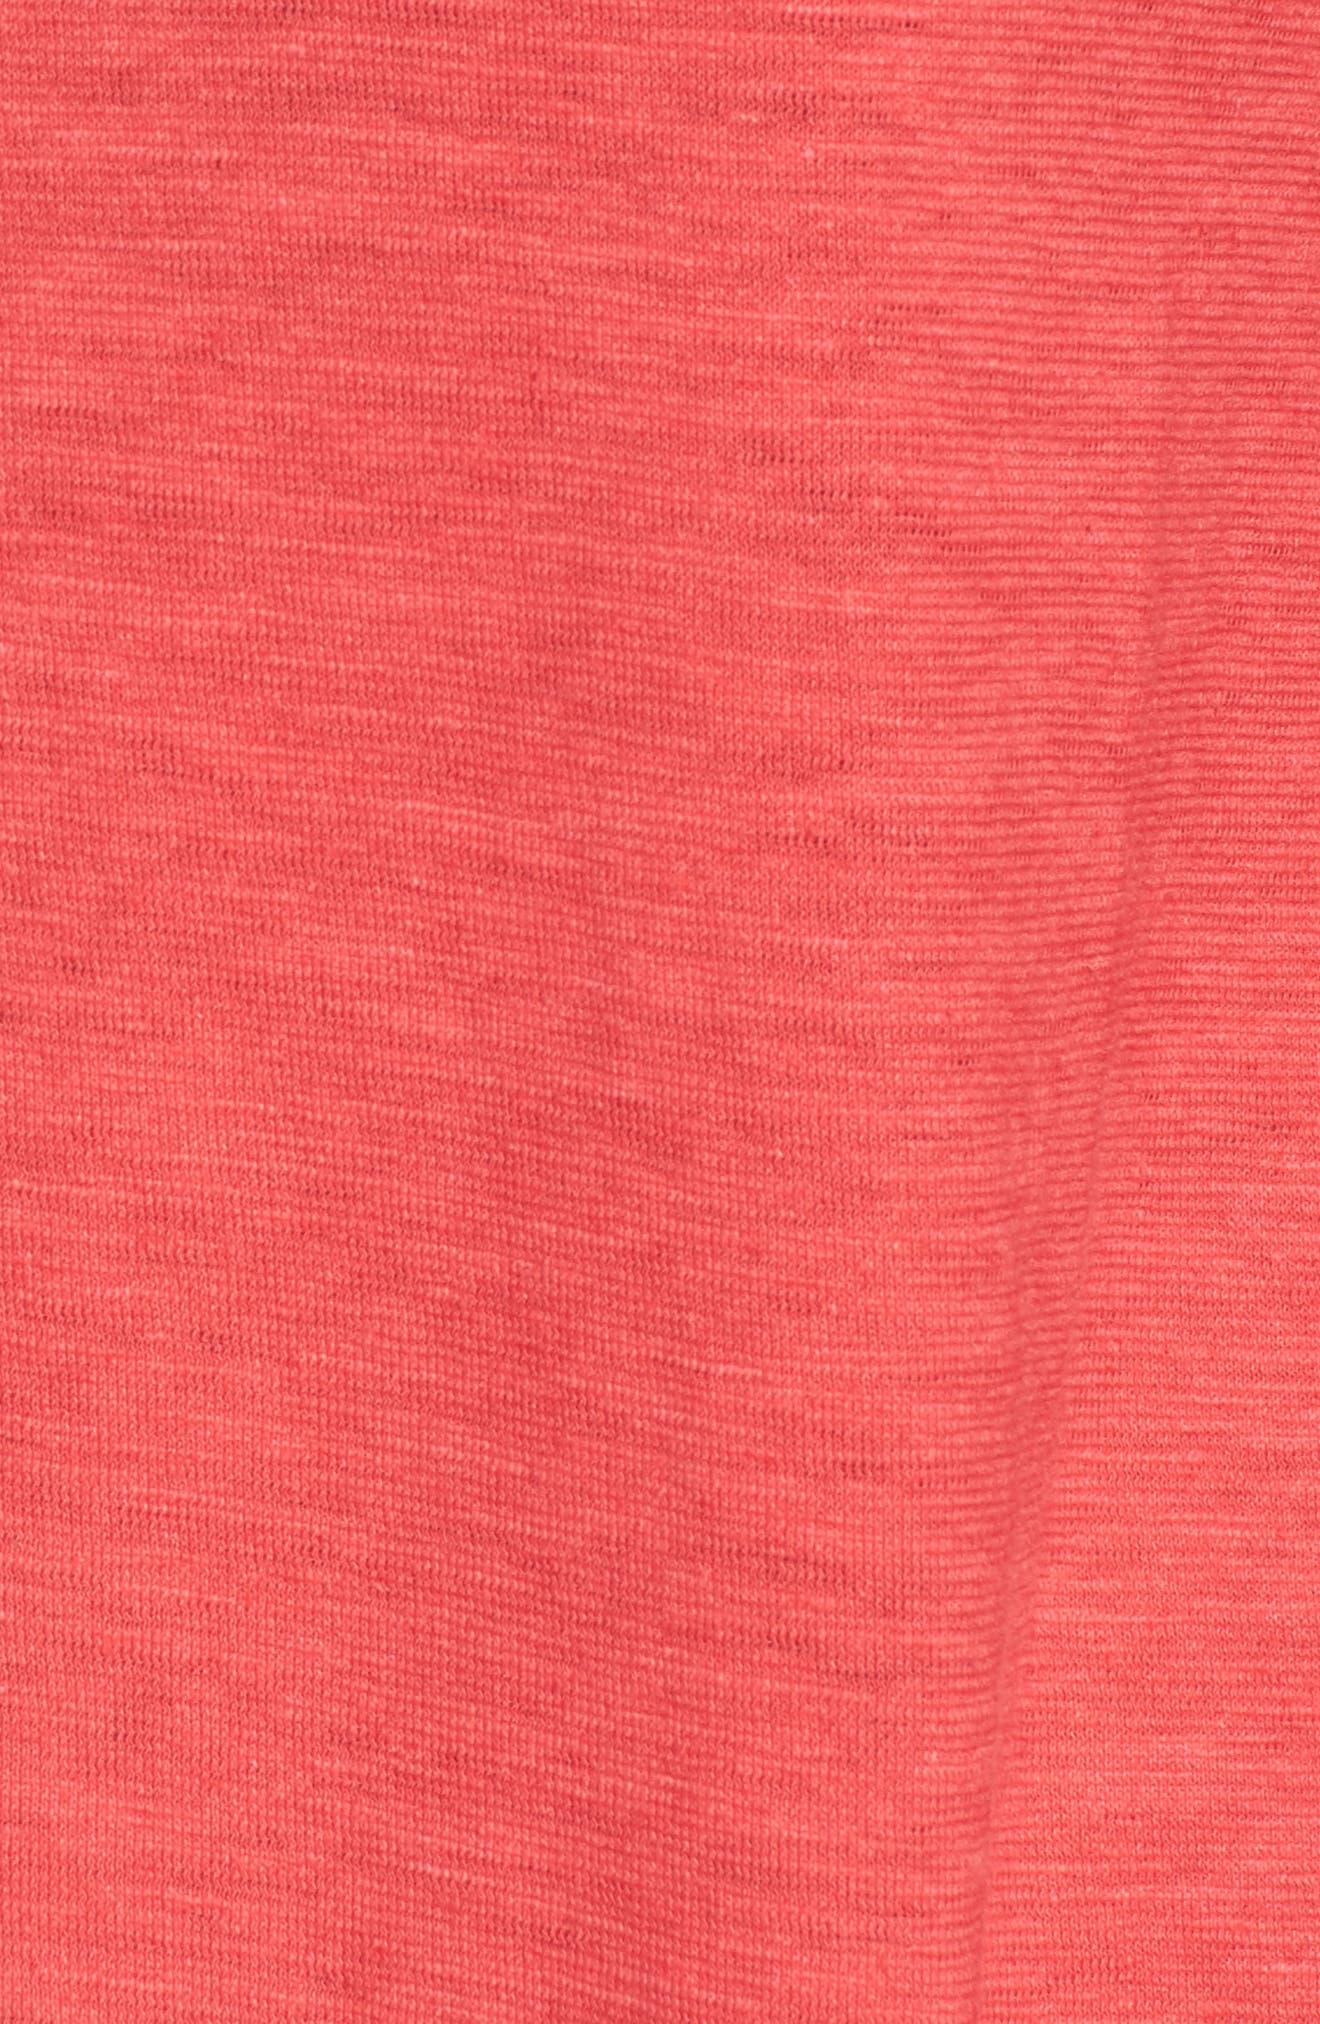 Slub Jersey Tunic Top,                             Alternate thumbnail 5, color,                             Strawberry